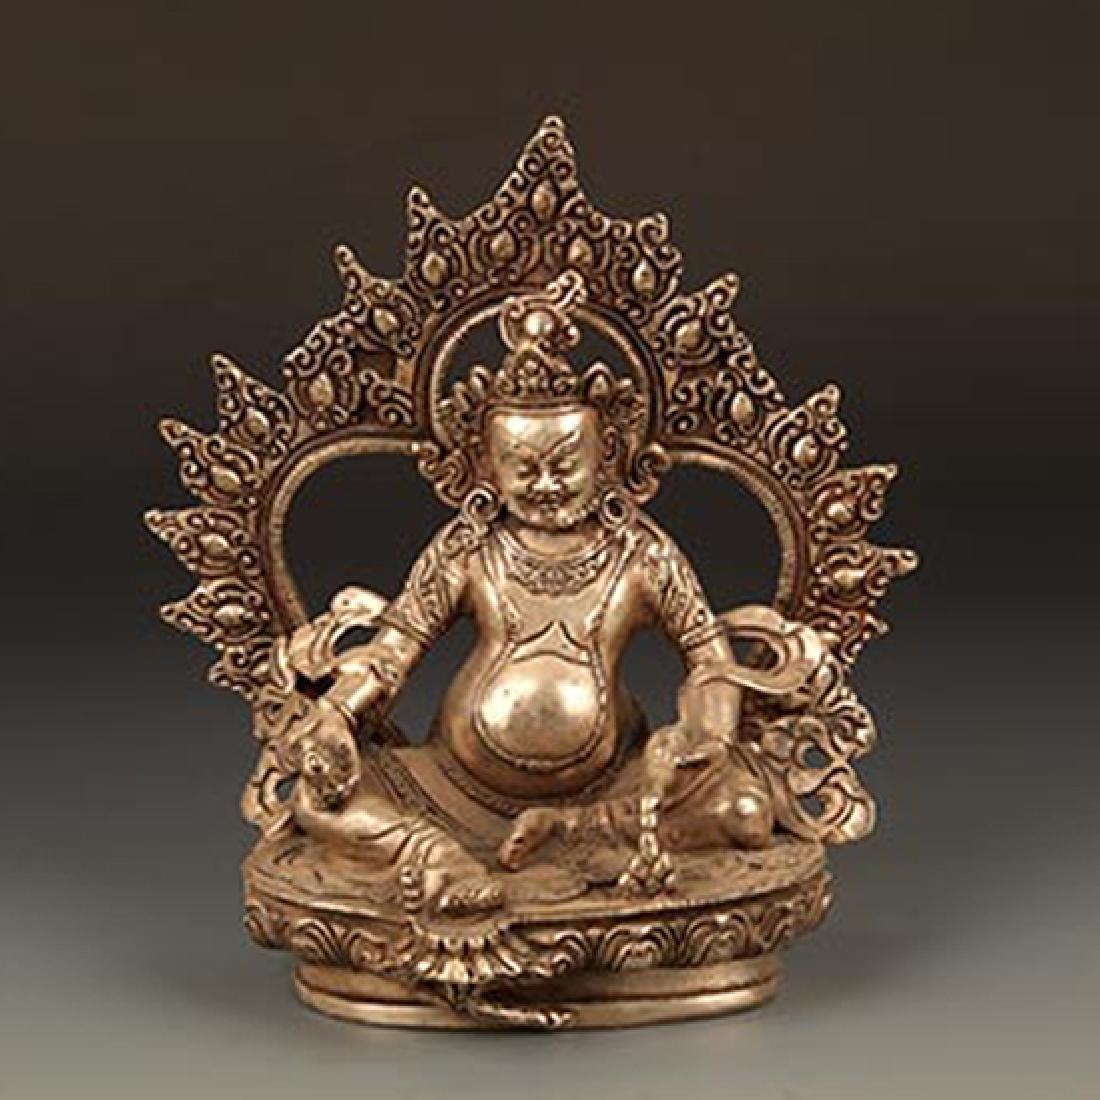 A FINE TIBETAN BUDDHA WITH HOLLOW